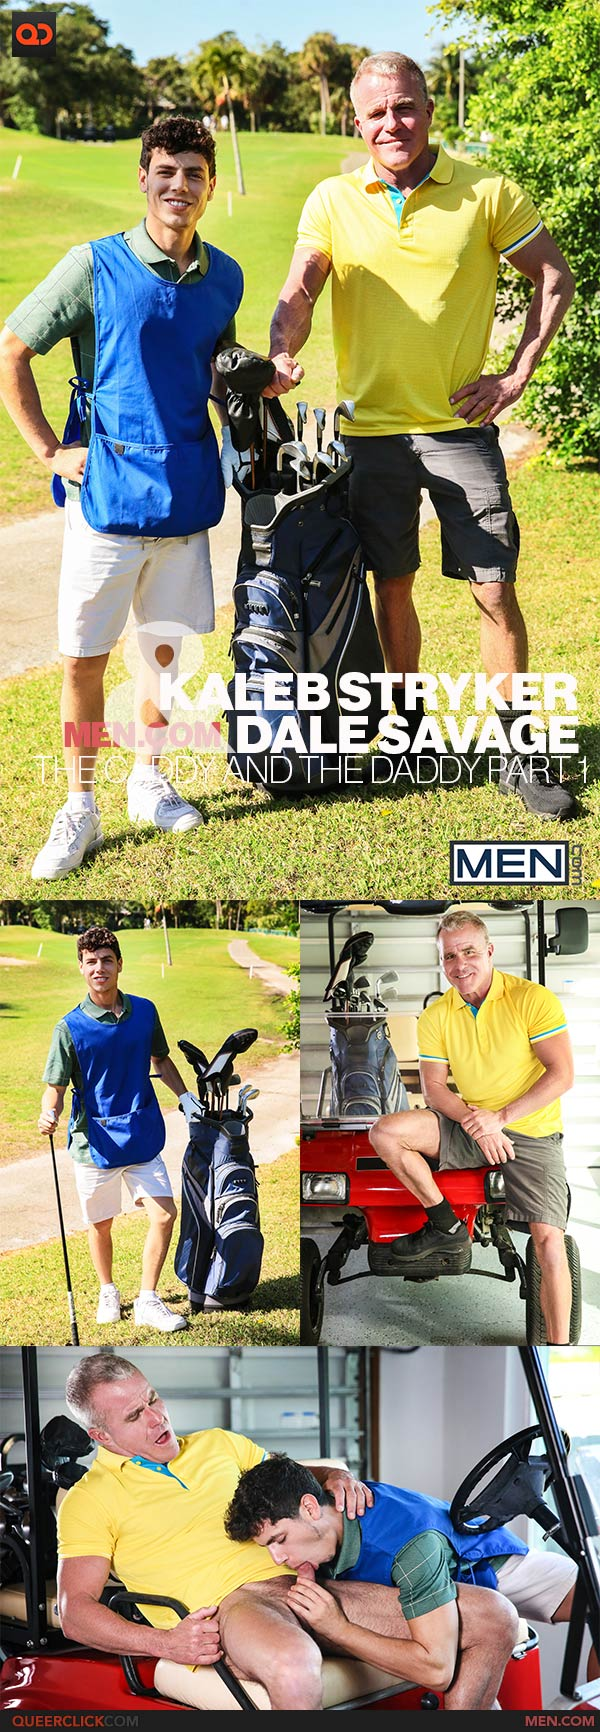 Men.com: Kaleb Stryker and Dale Savage